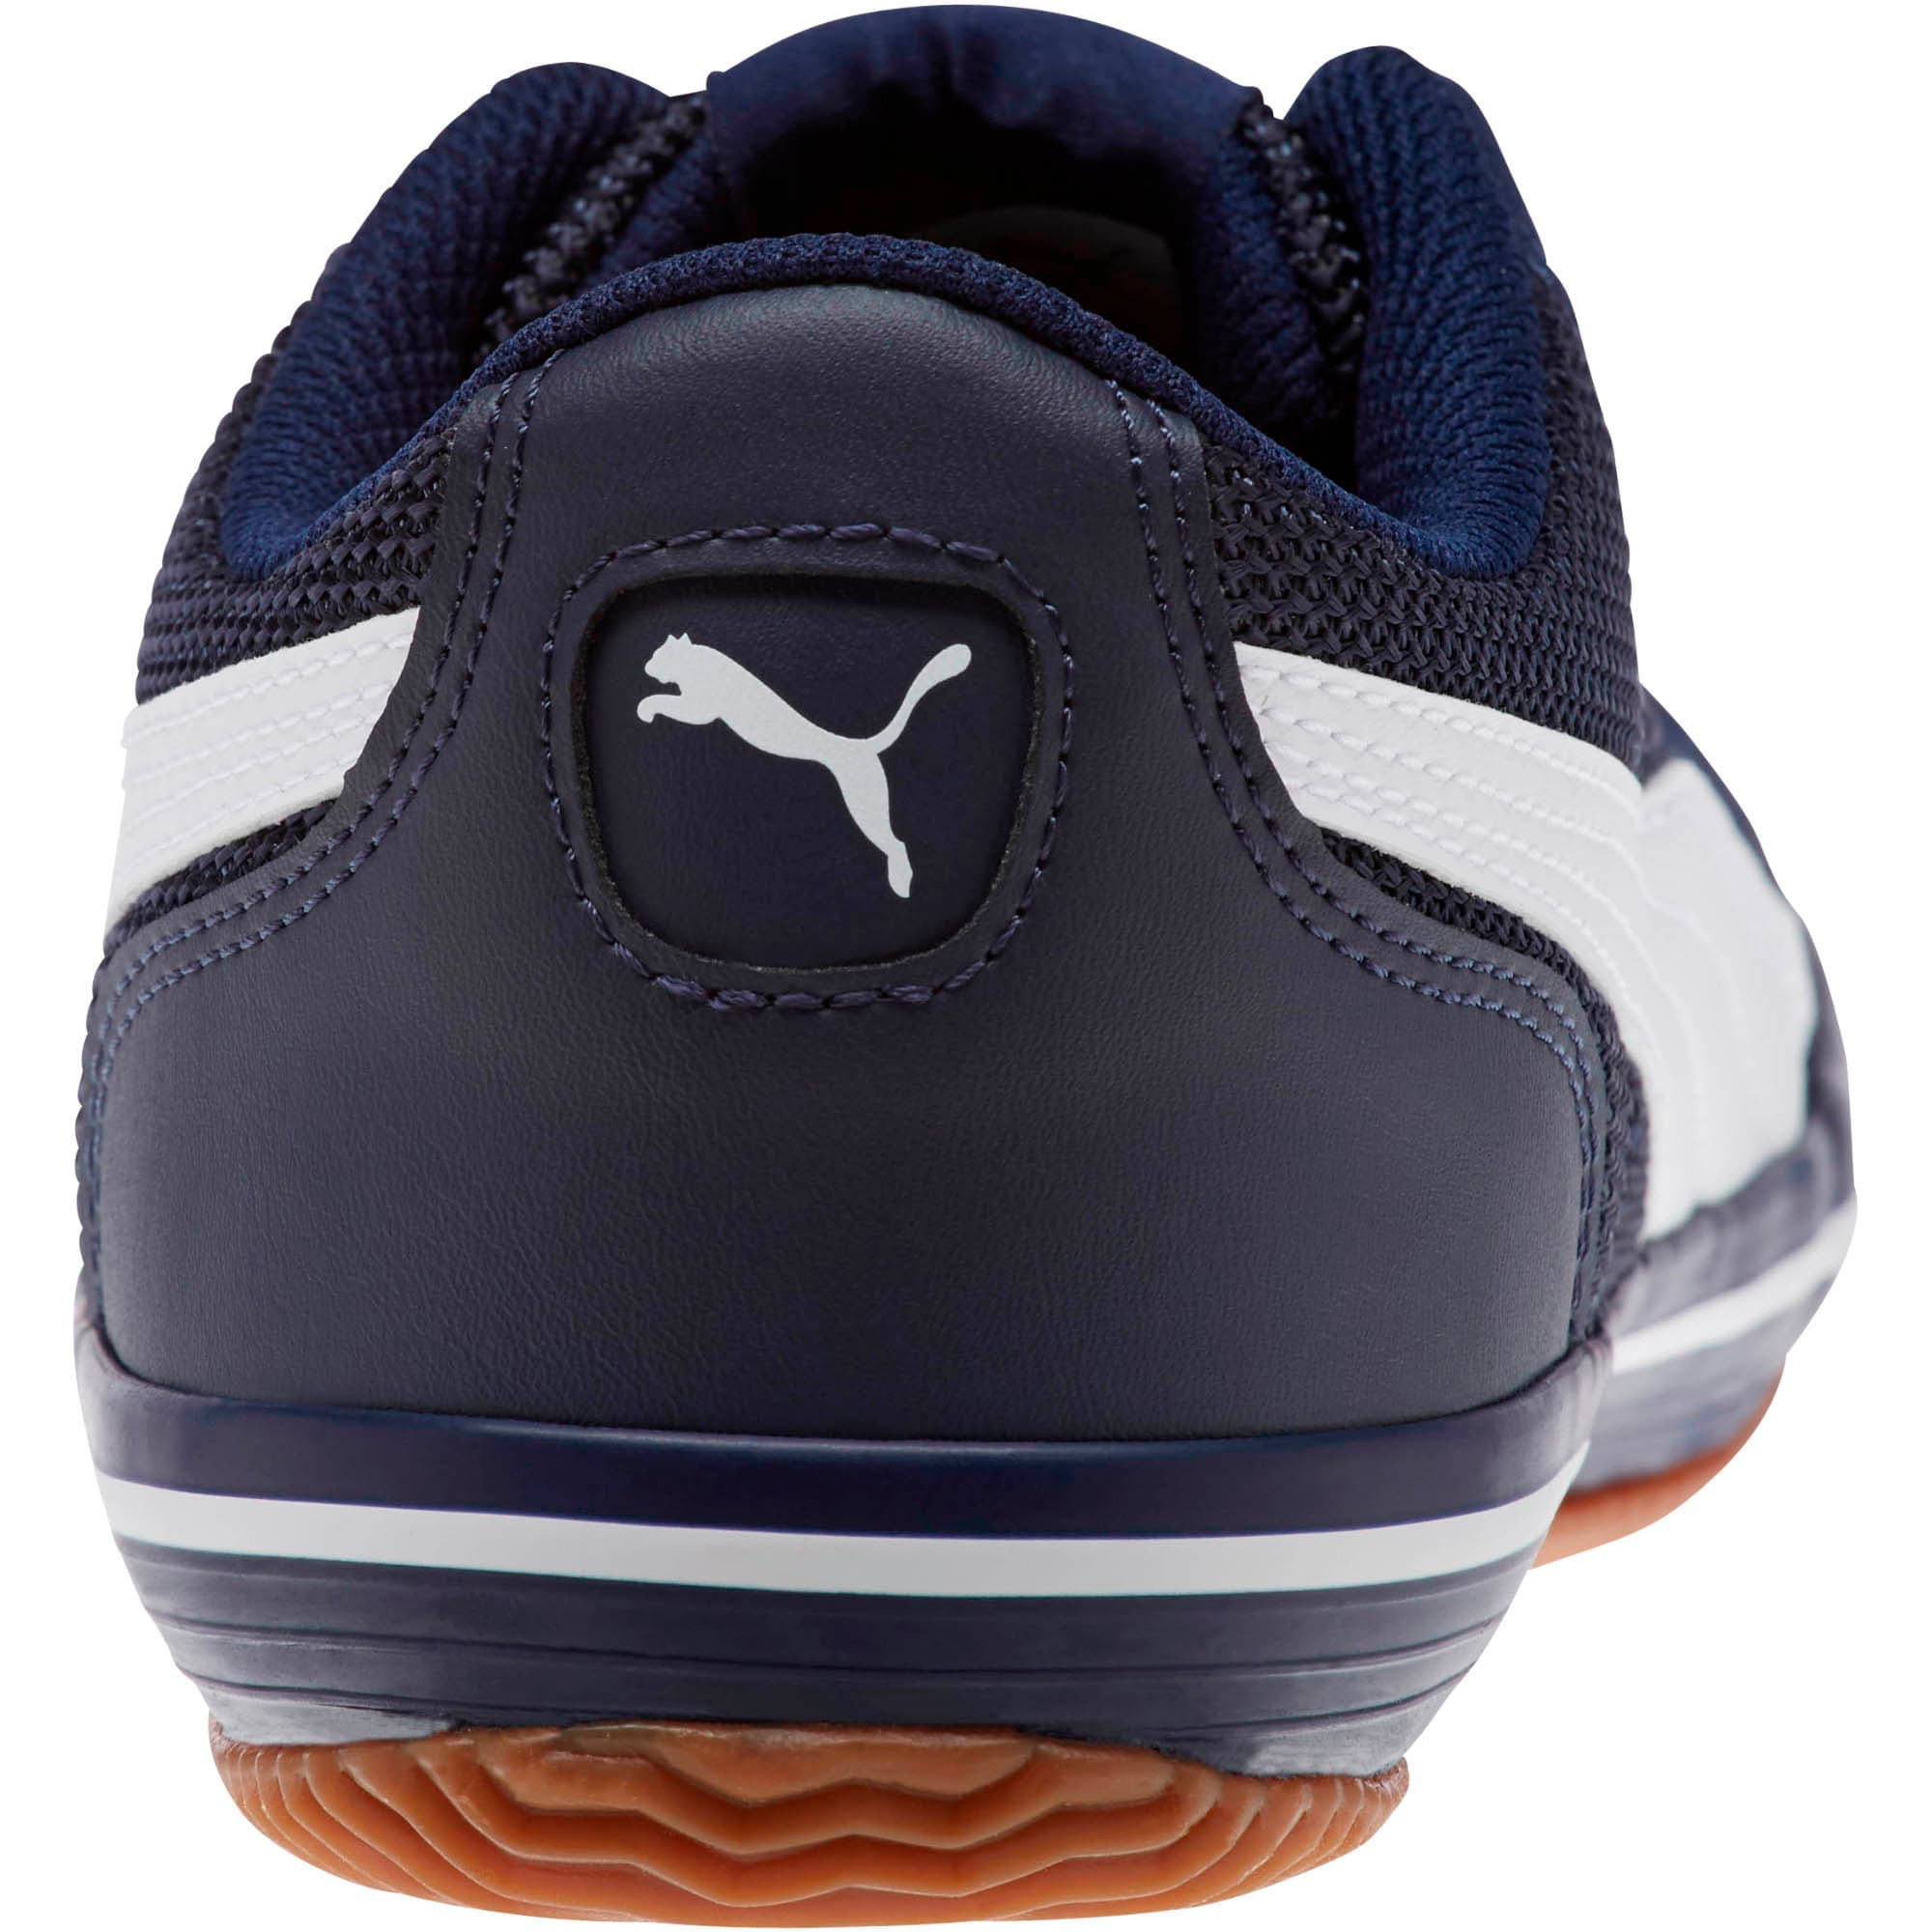 Miniatura 4 de Zapatos deportivos Astro Sala para hombre, Peacoat-Puma White, mediano